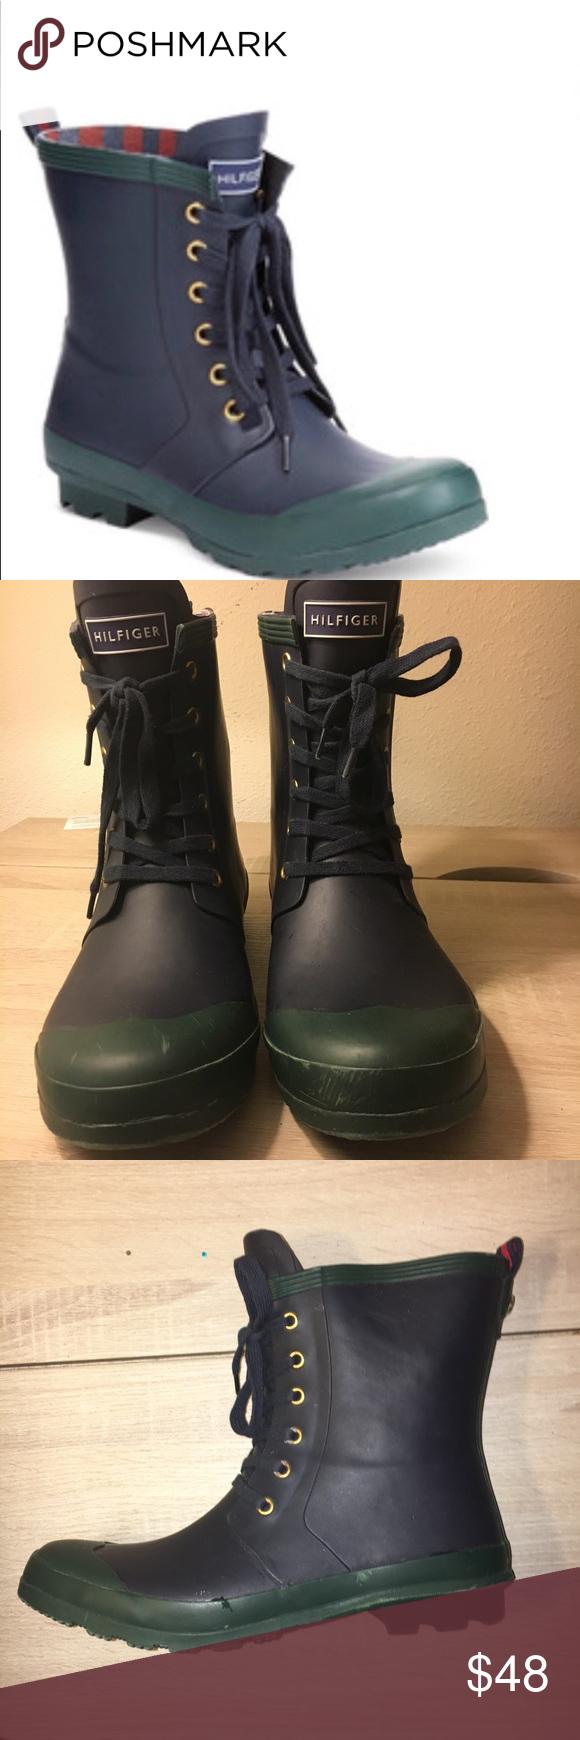 Tommy Hilfiger Renegade Rain Boots